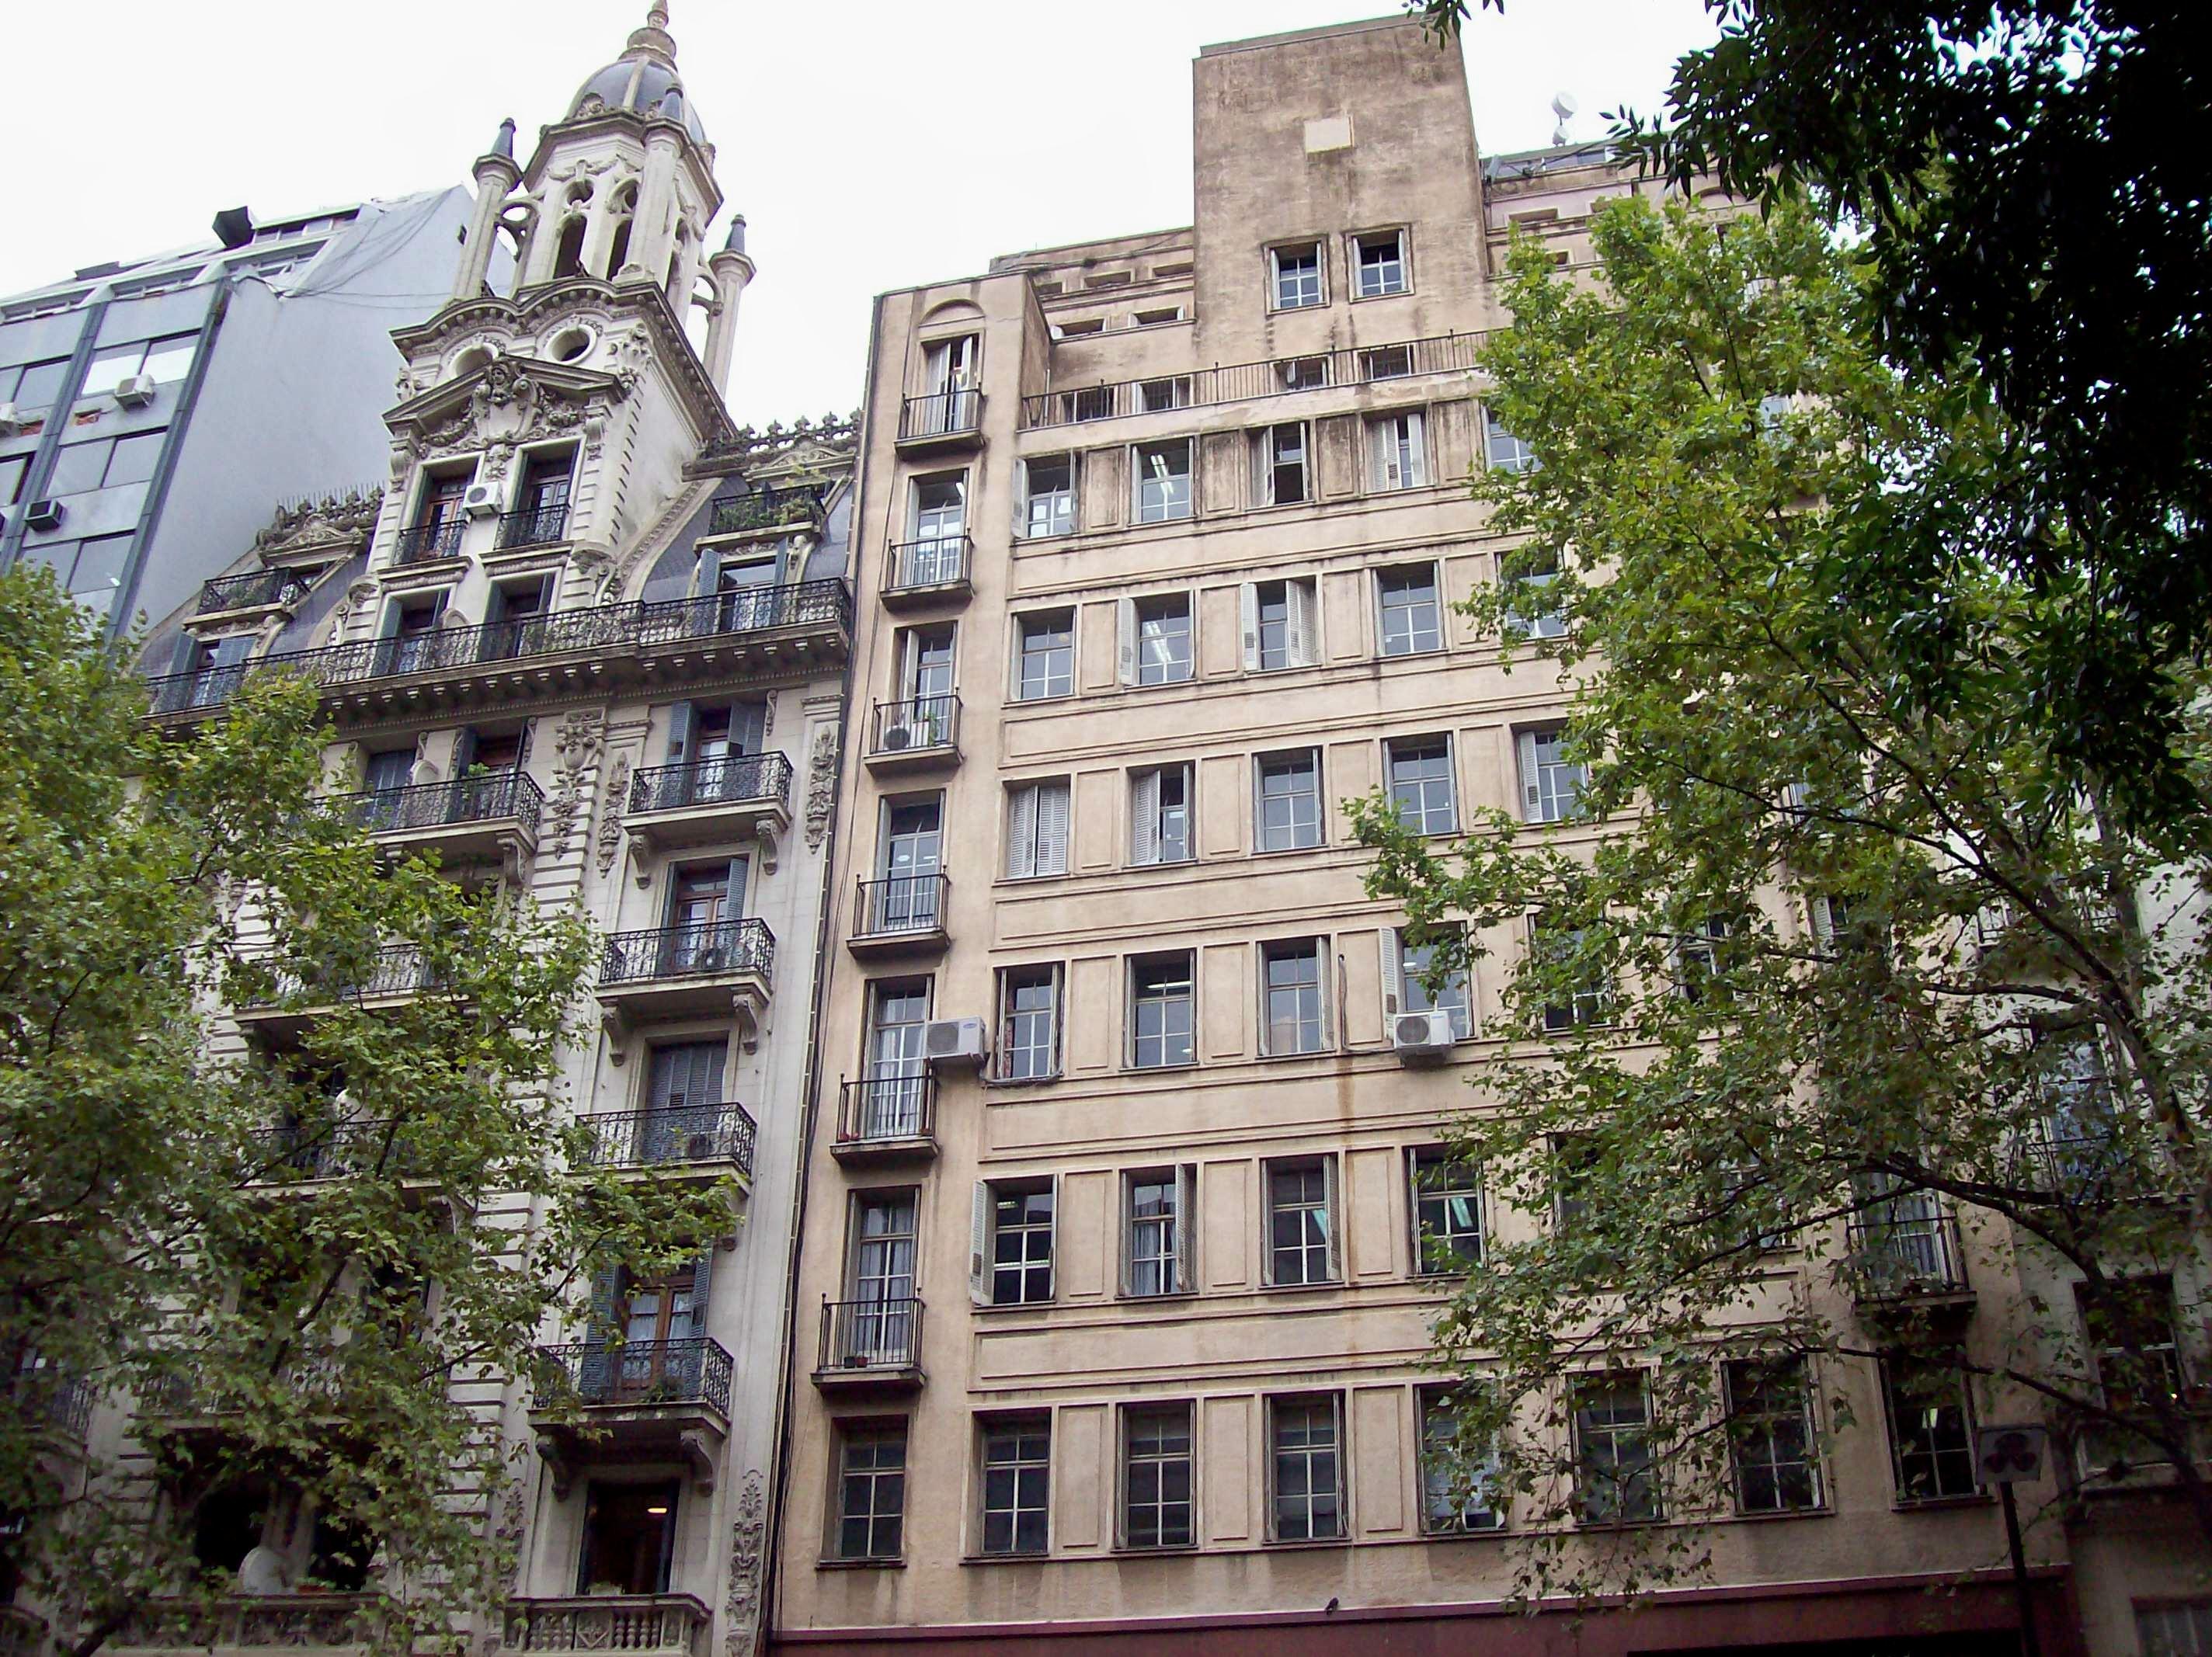 File:Avenida de Mayo ANMAT.jpg - Wikimedia Commons